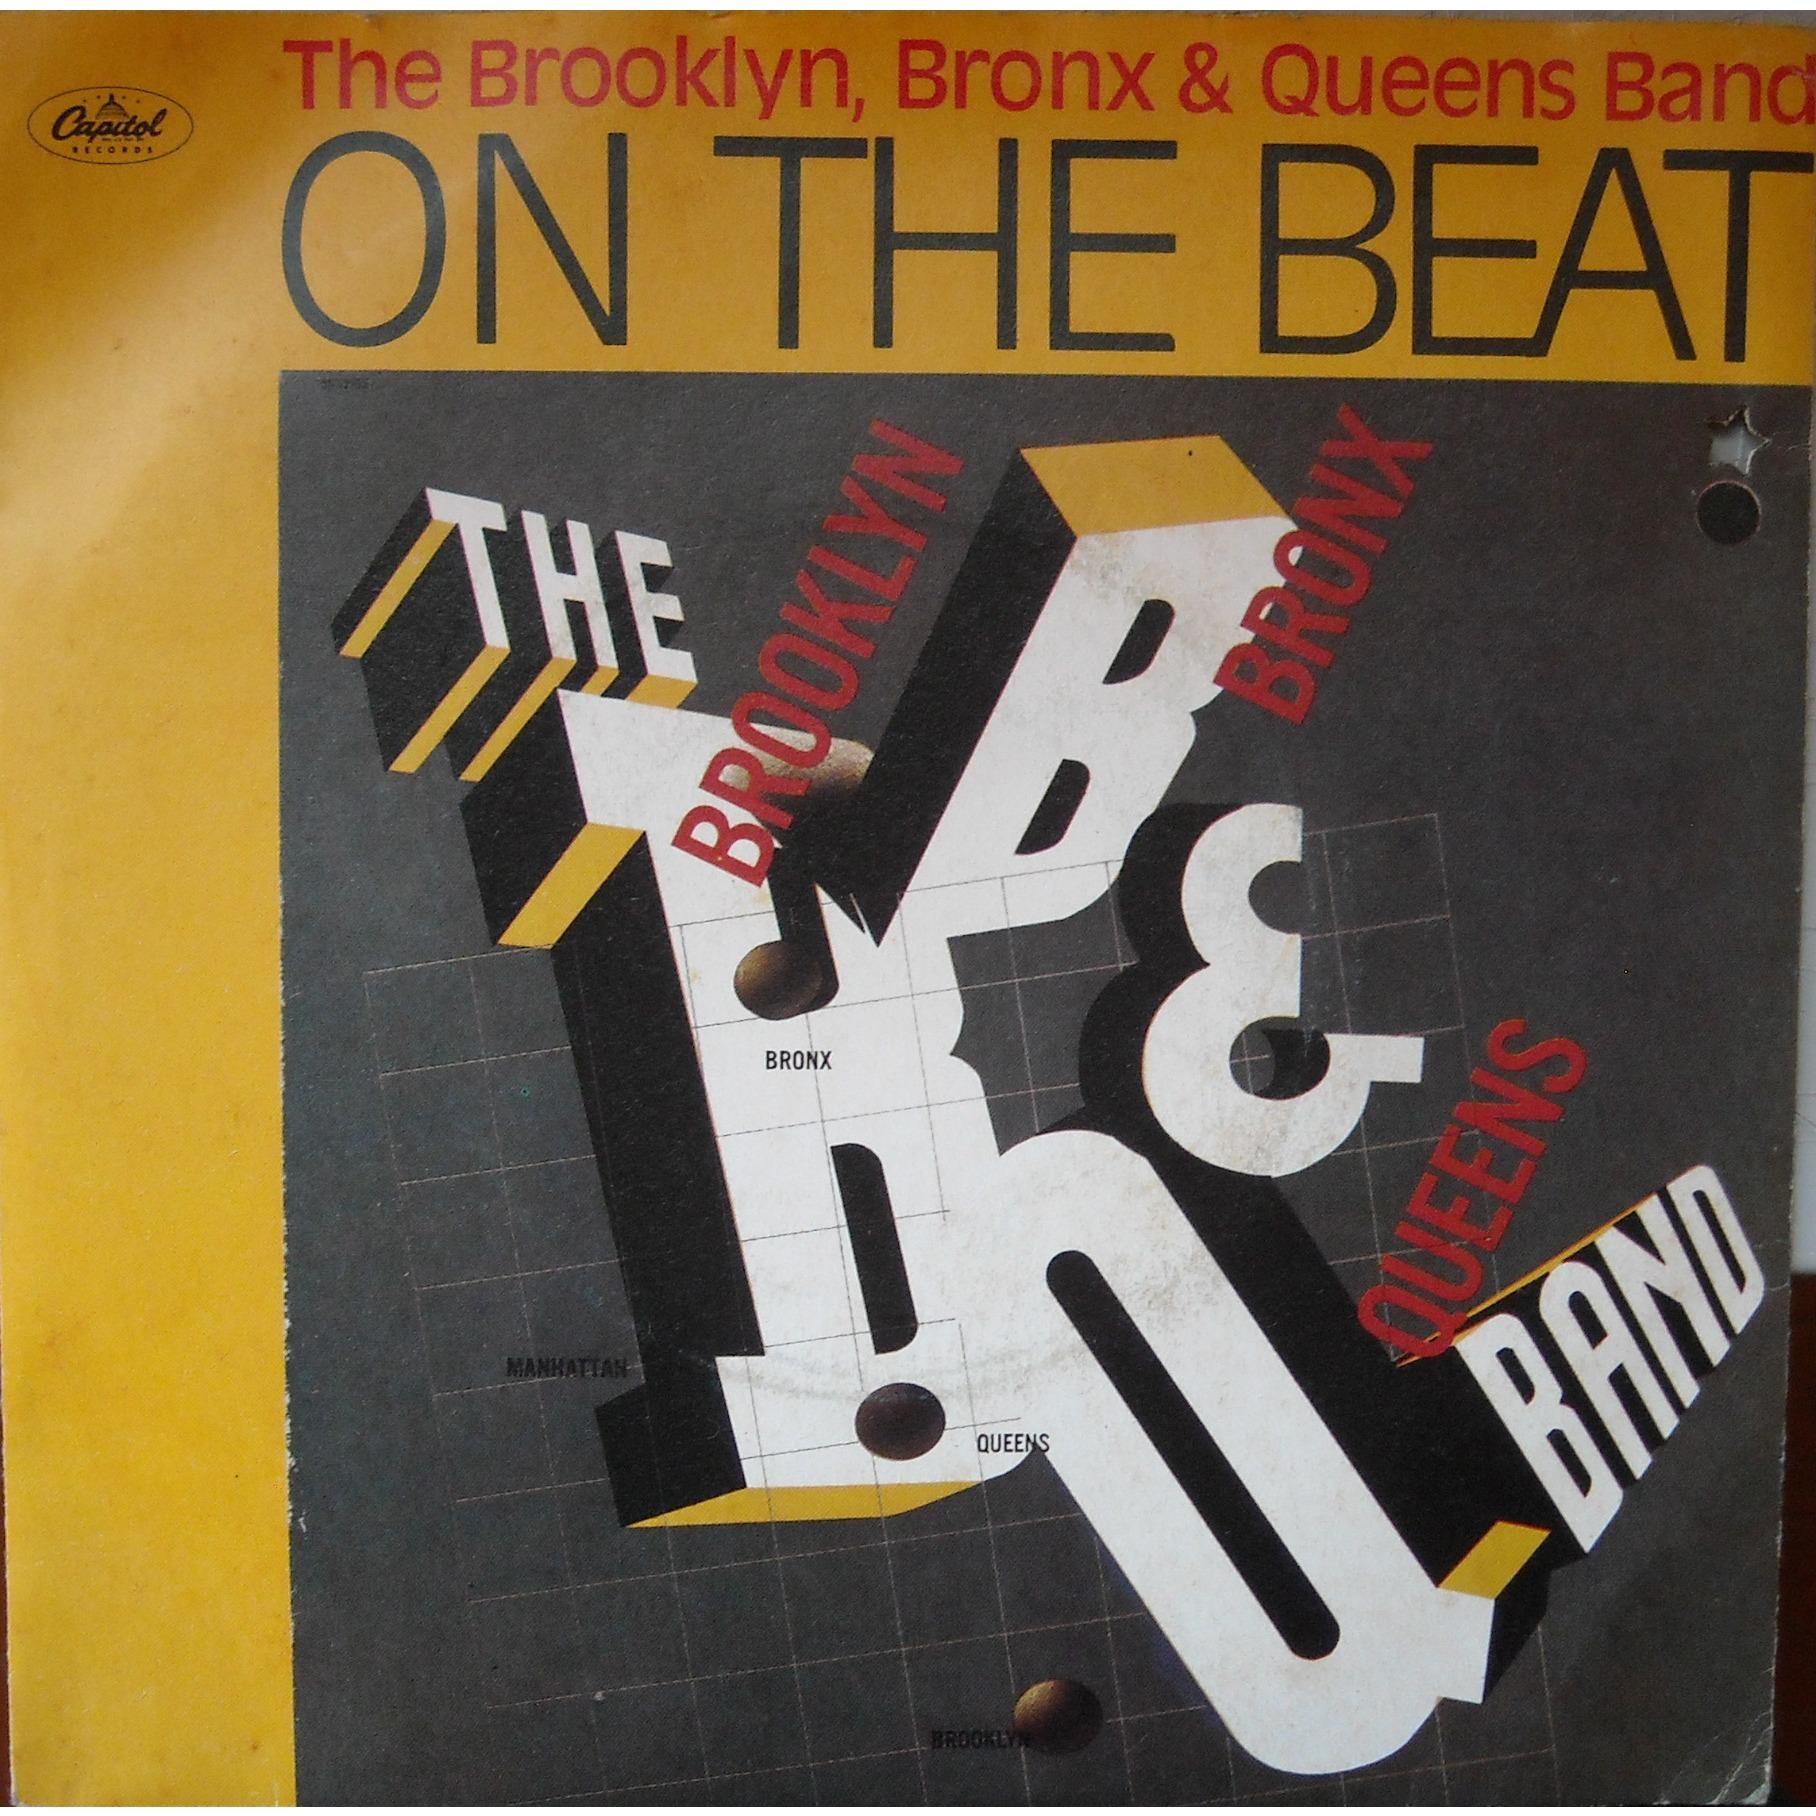 On the beat bb & q band copertina 45 giri 1980